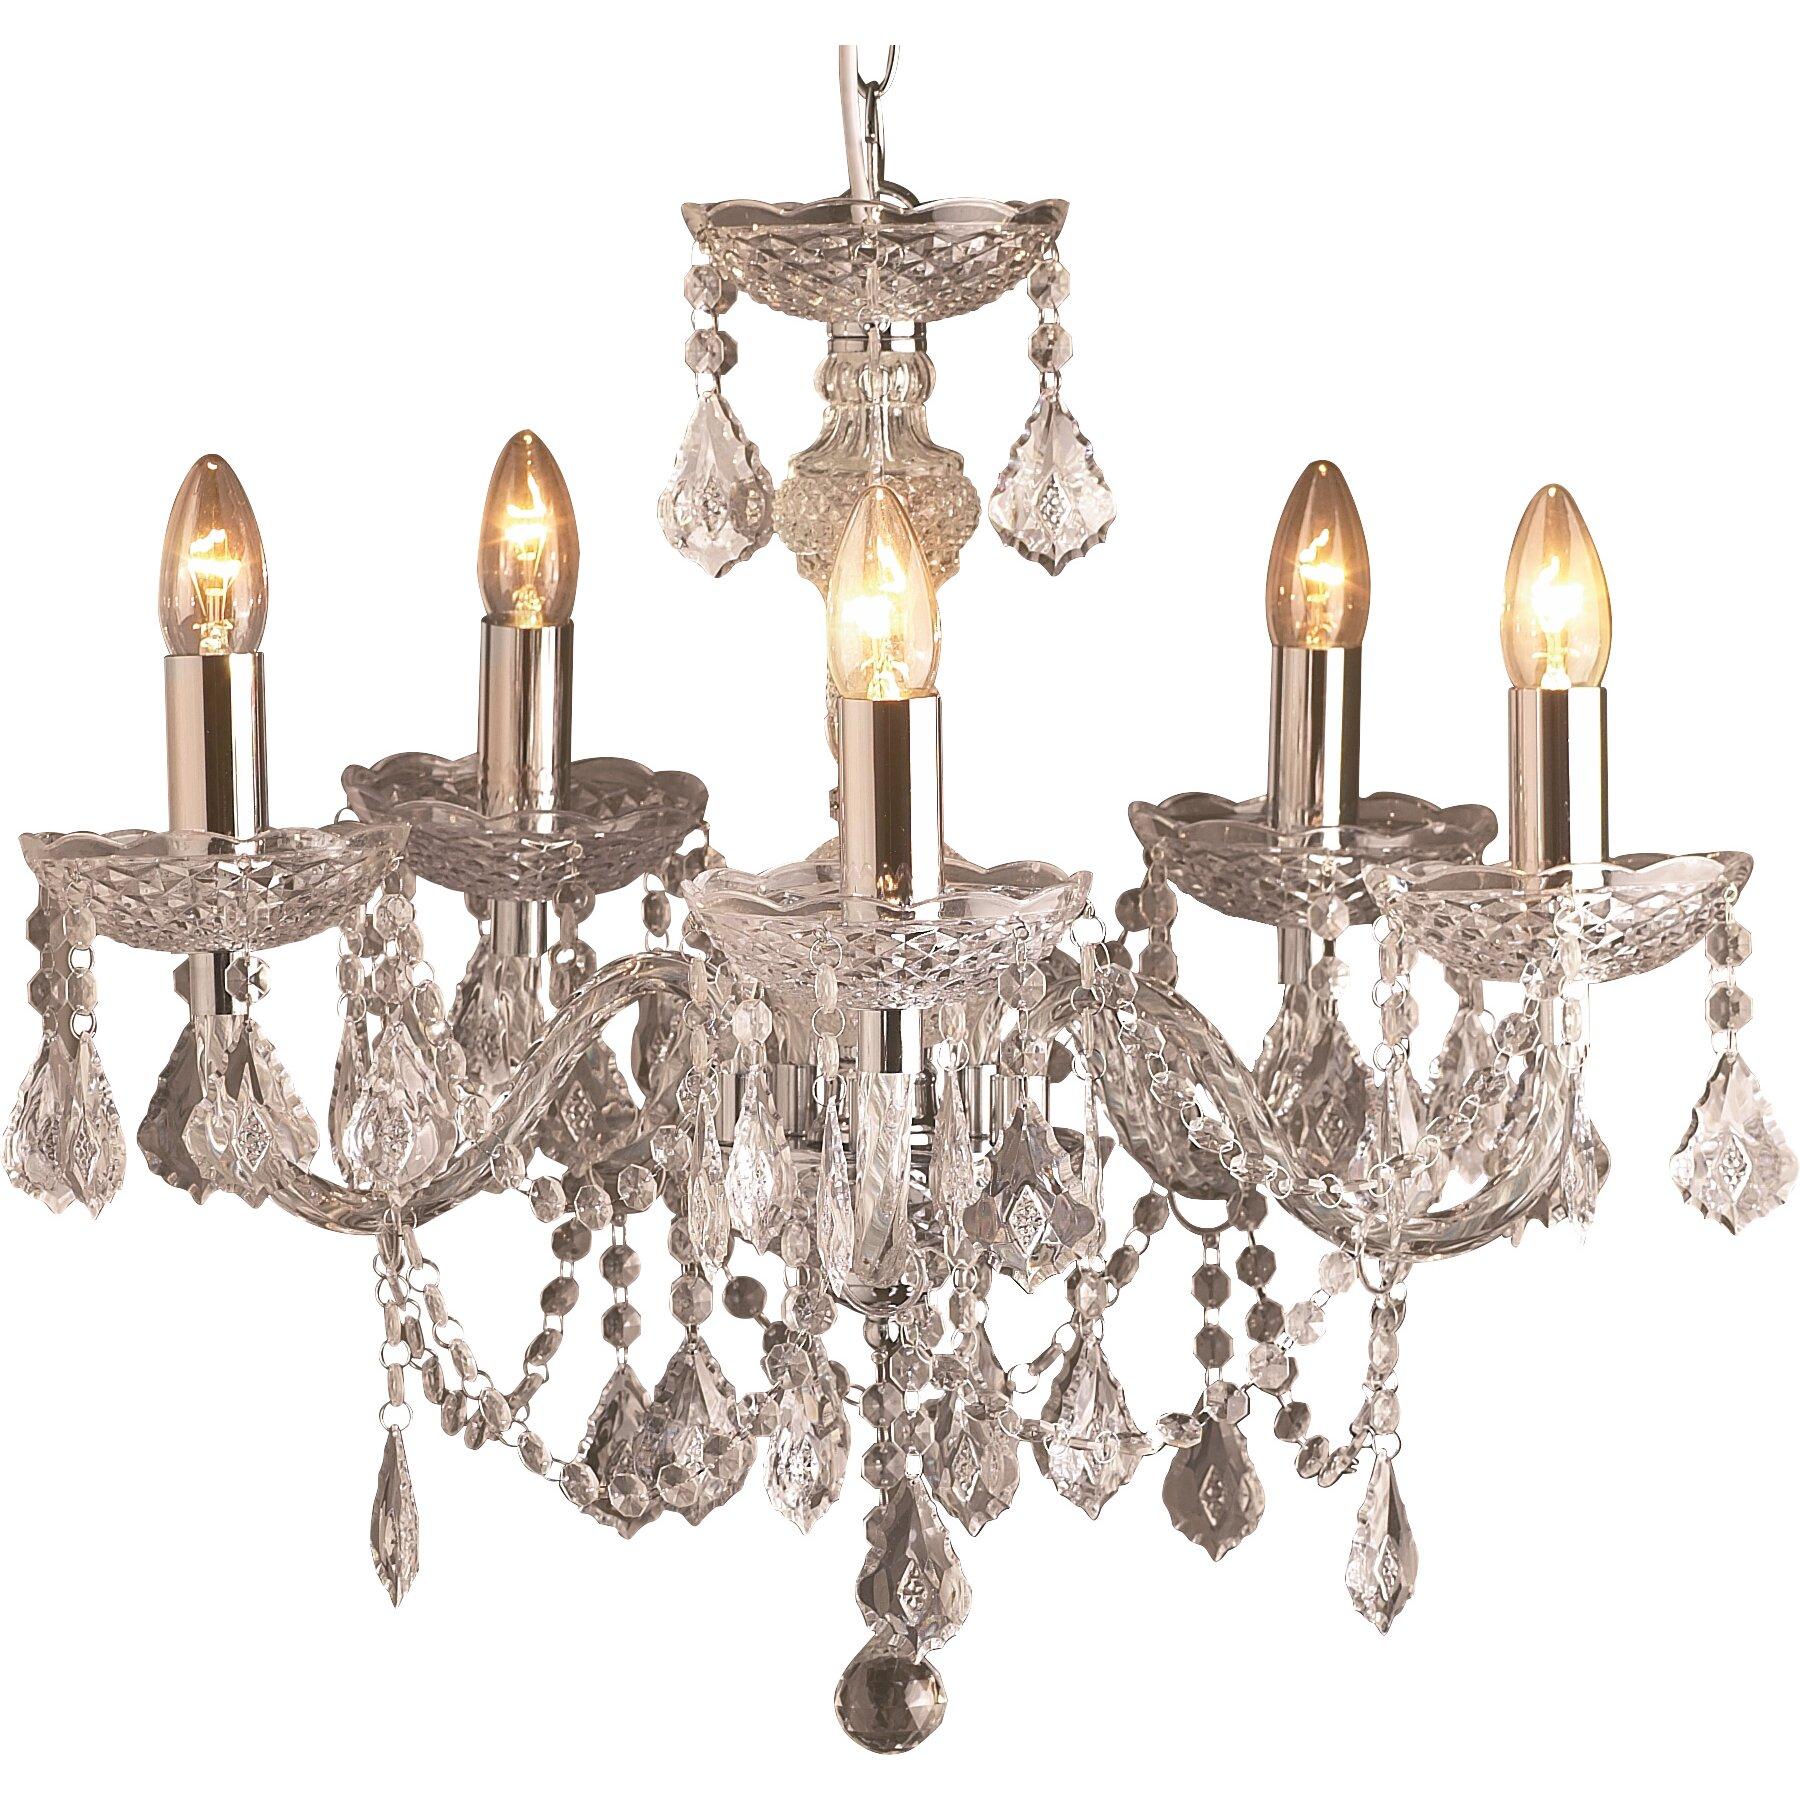 loxton lighting strauss 5 light candle style chandelier reviews wayfair uk